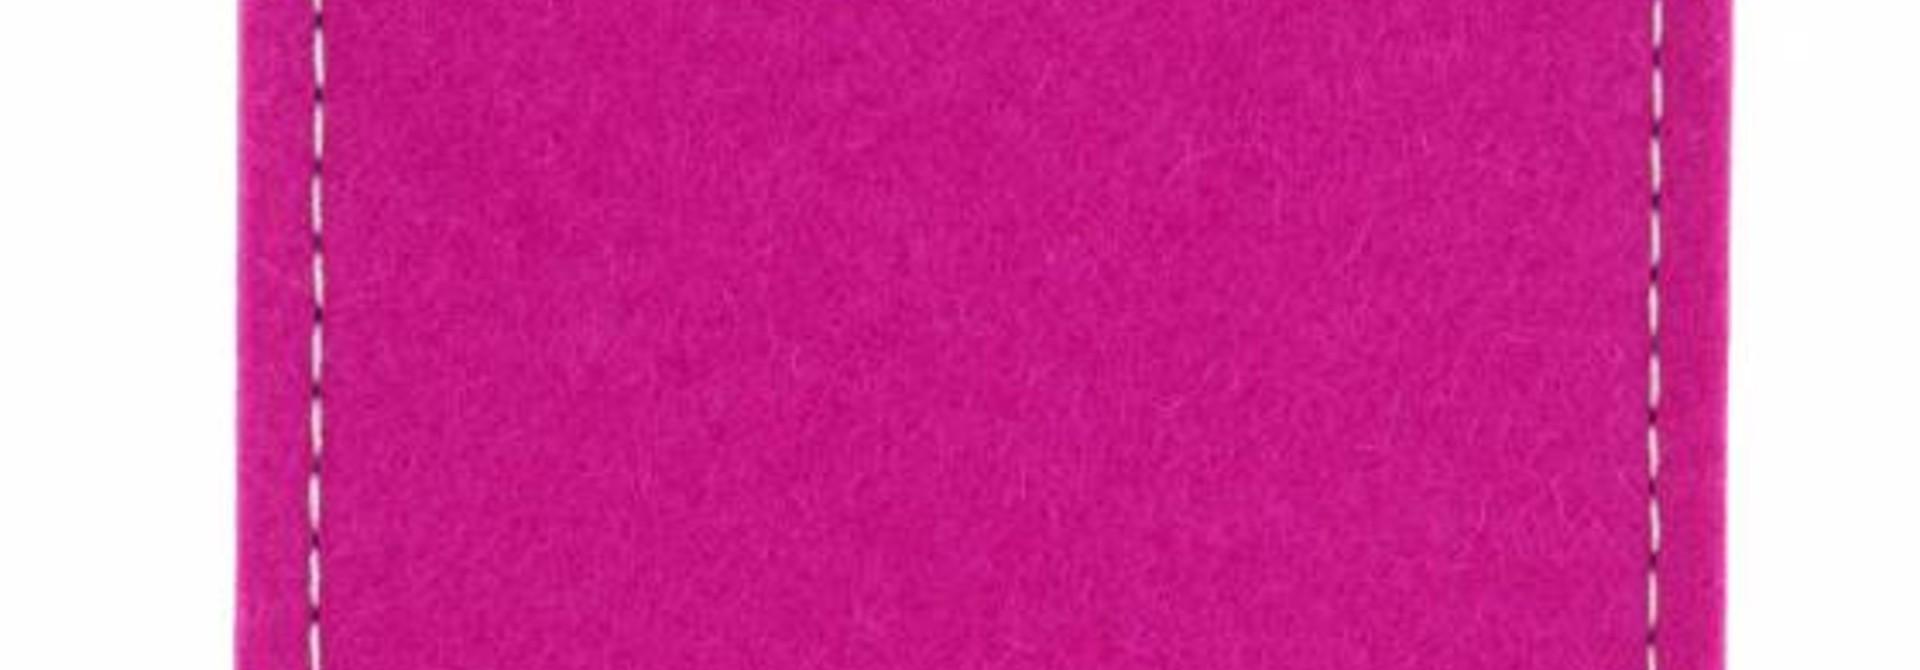 Sleeve Pink